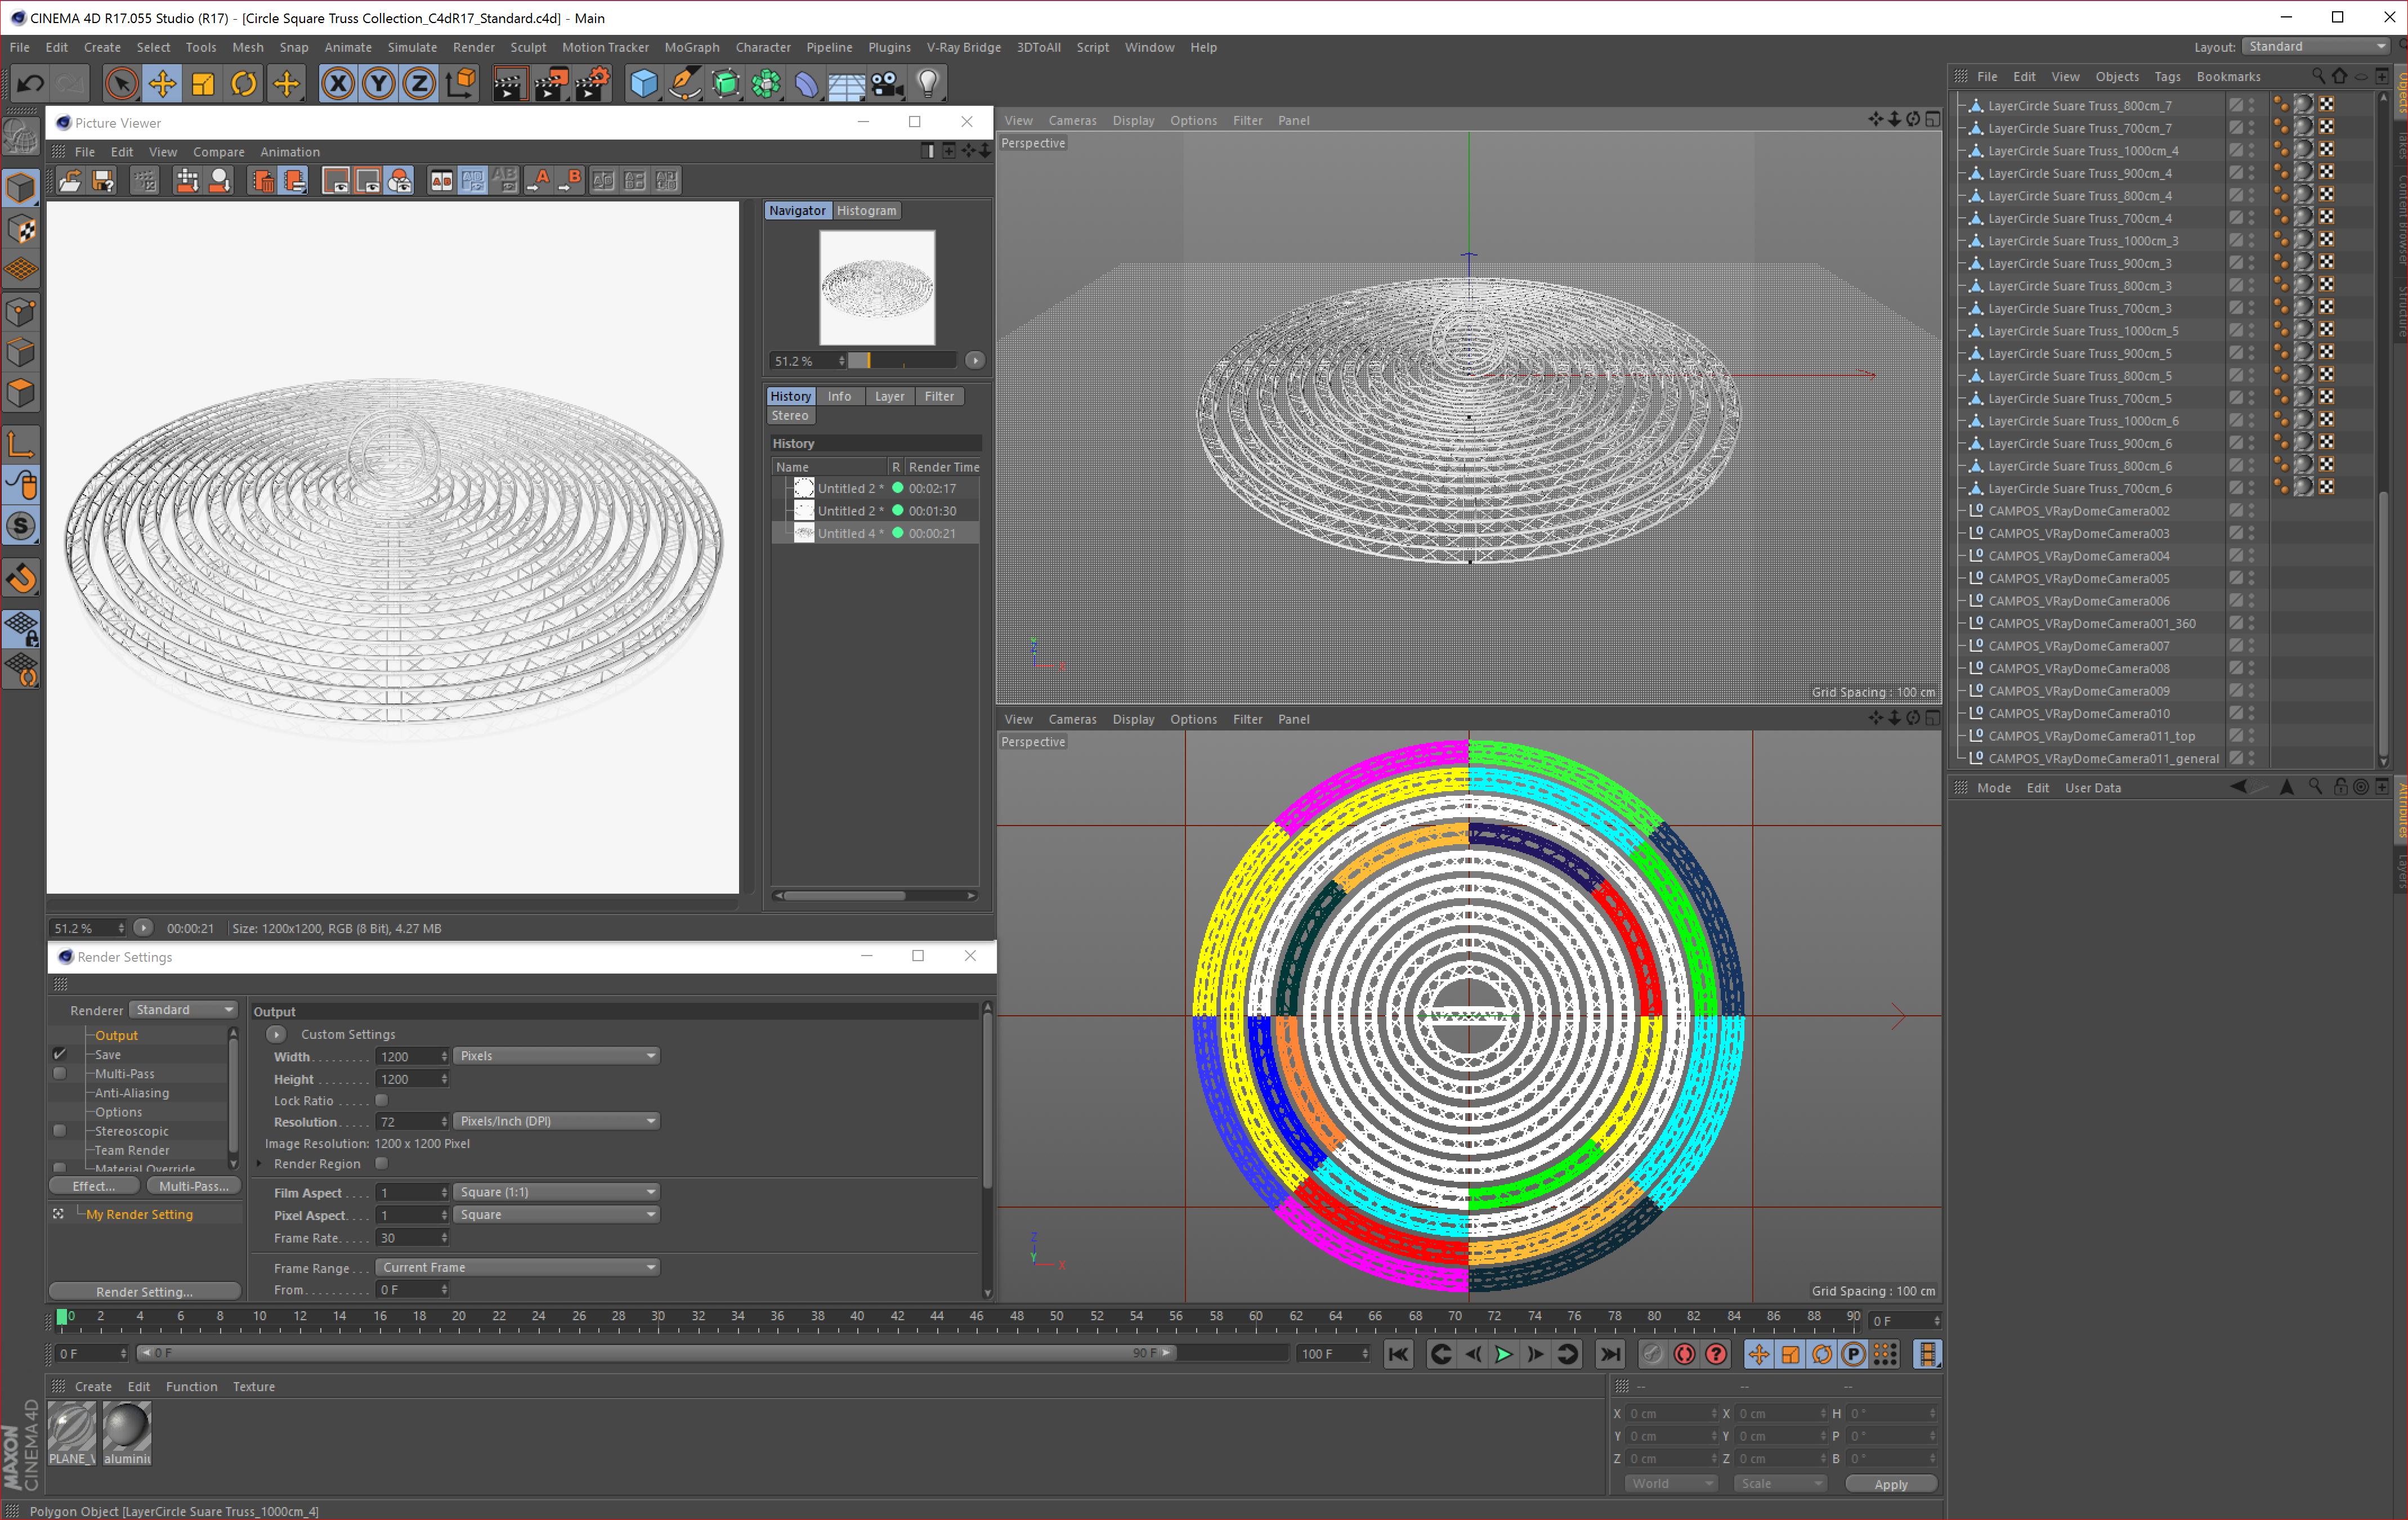 circle square truss modular collection 3d model 3ds max dxf fbx c4d dae  texture obj 252351